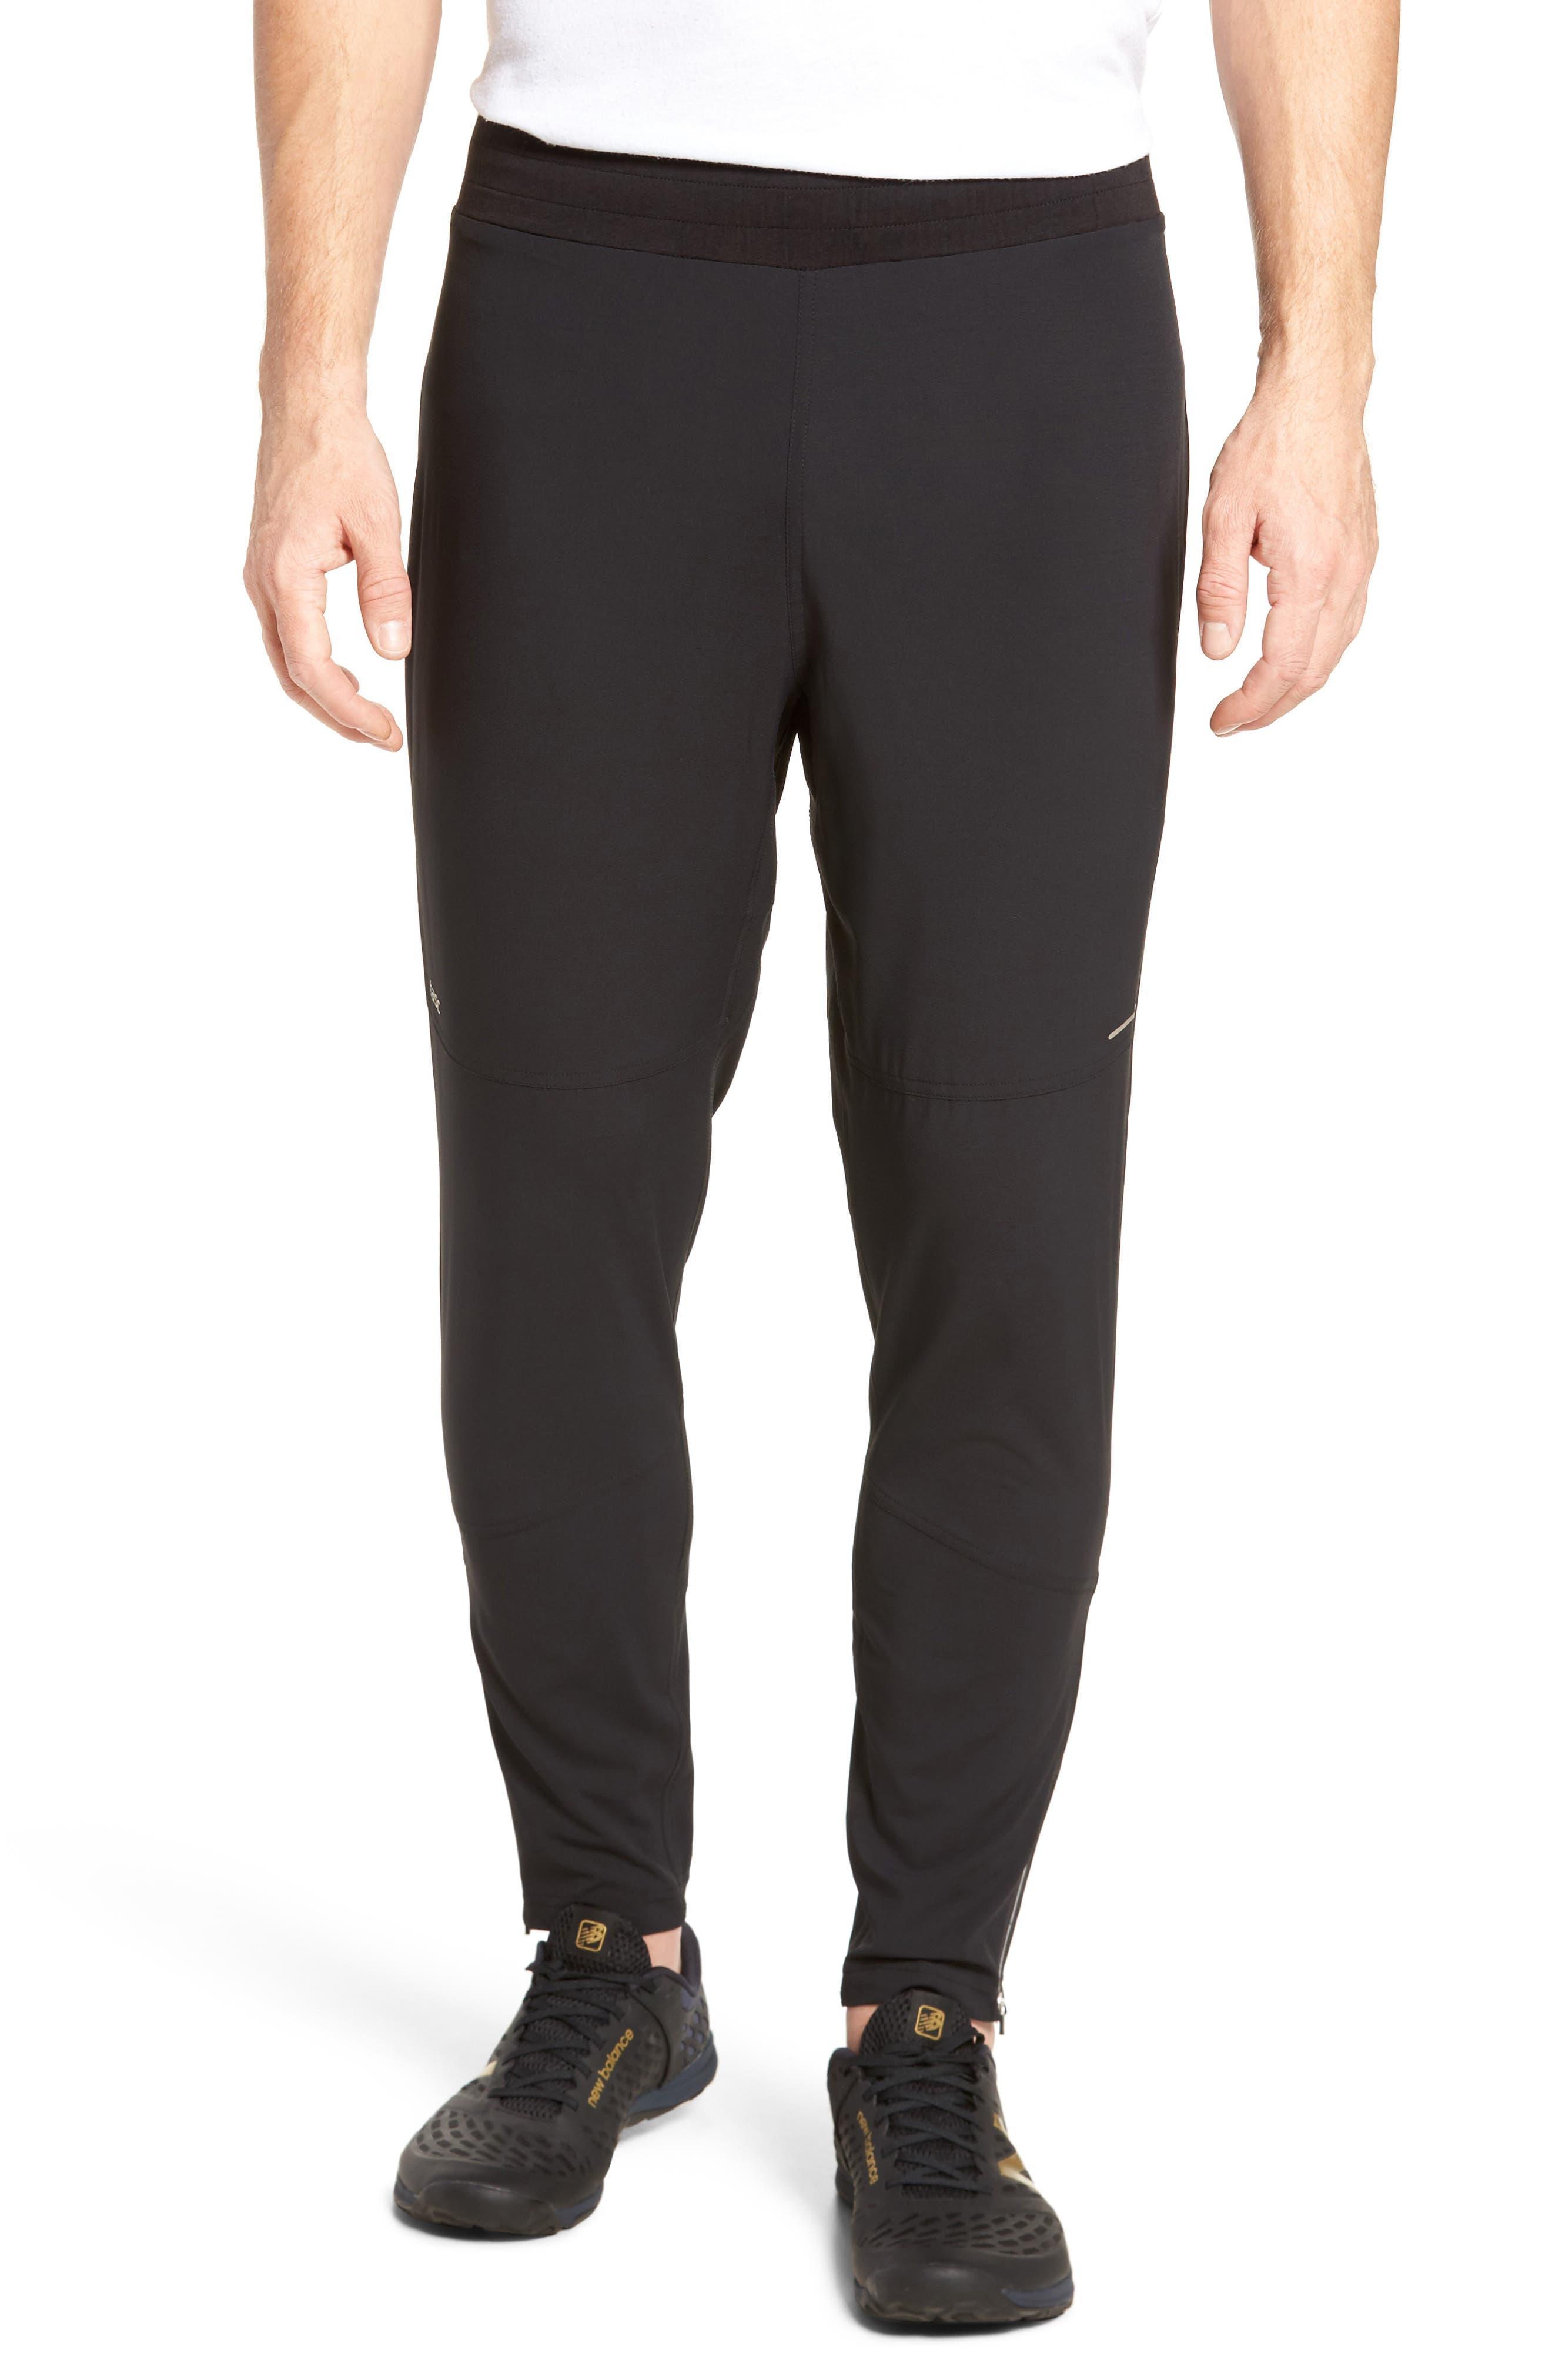 Velocity Track Pants,                         Main,                         color, Black